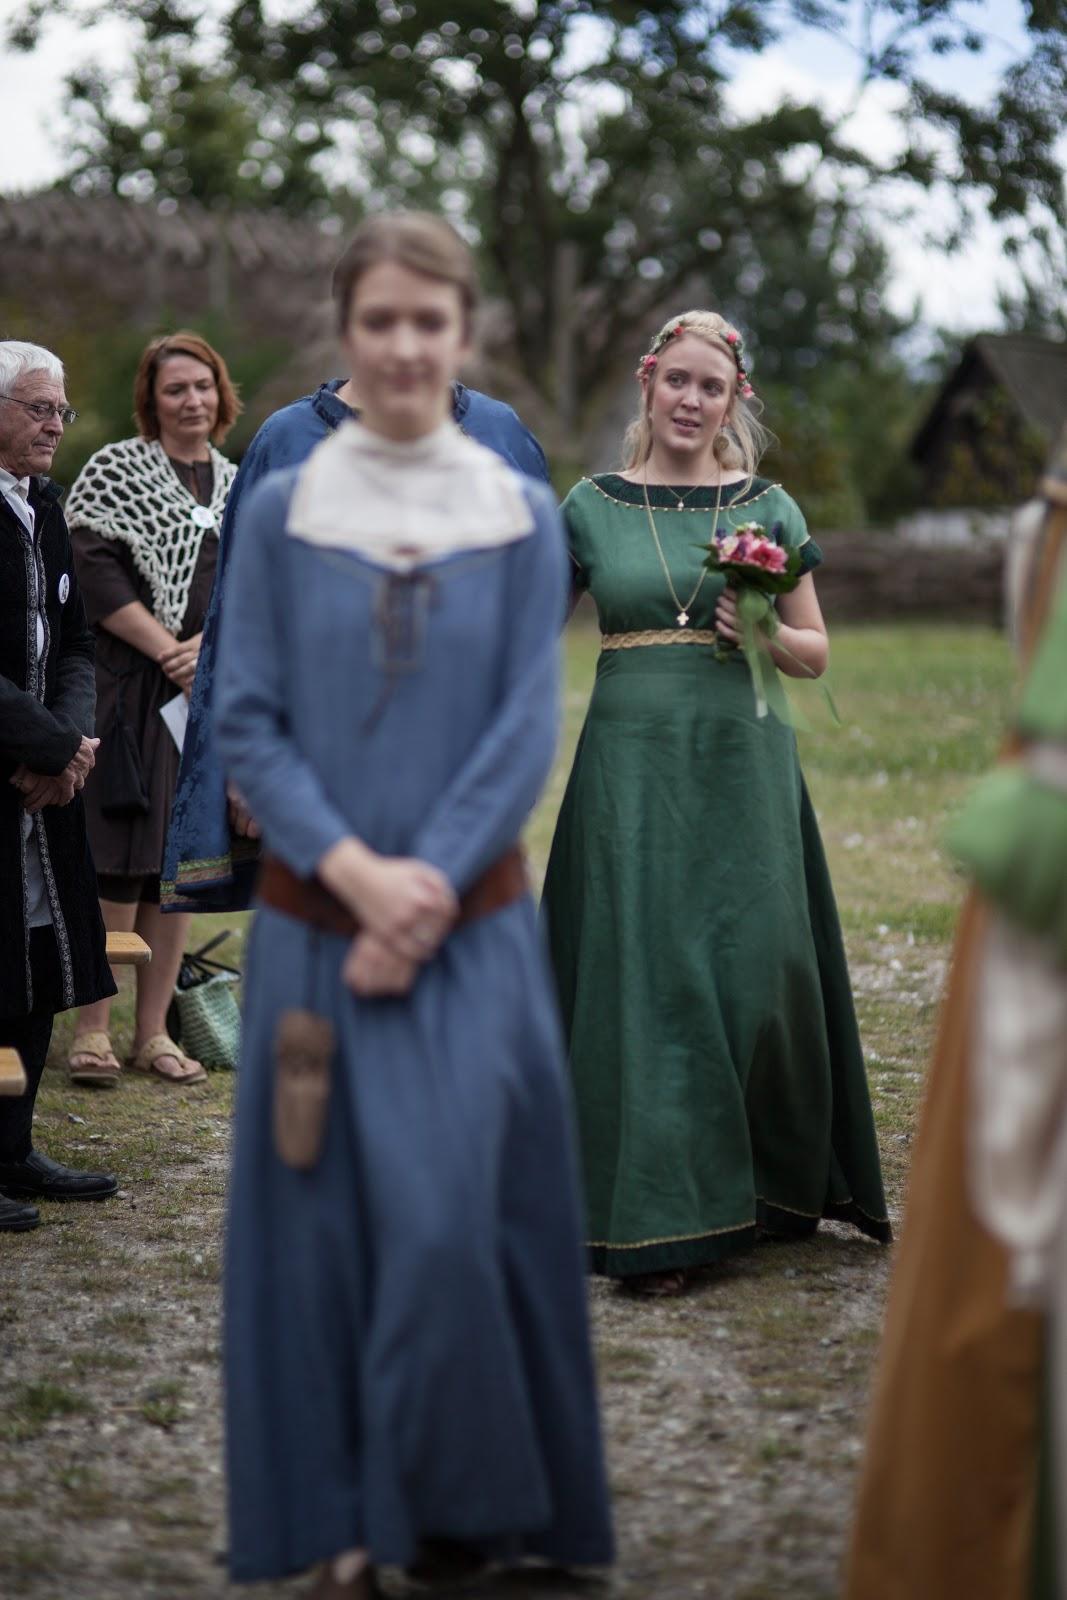 Medieval Bride: My medieval wedding - the ceremony